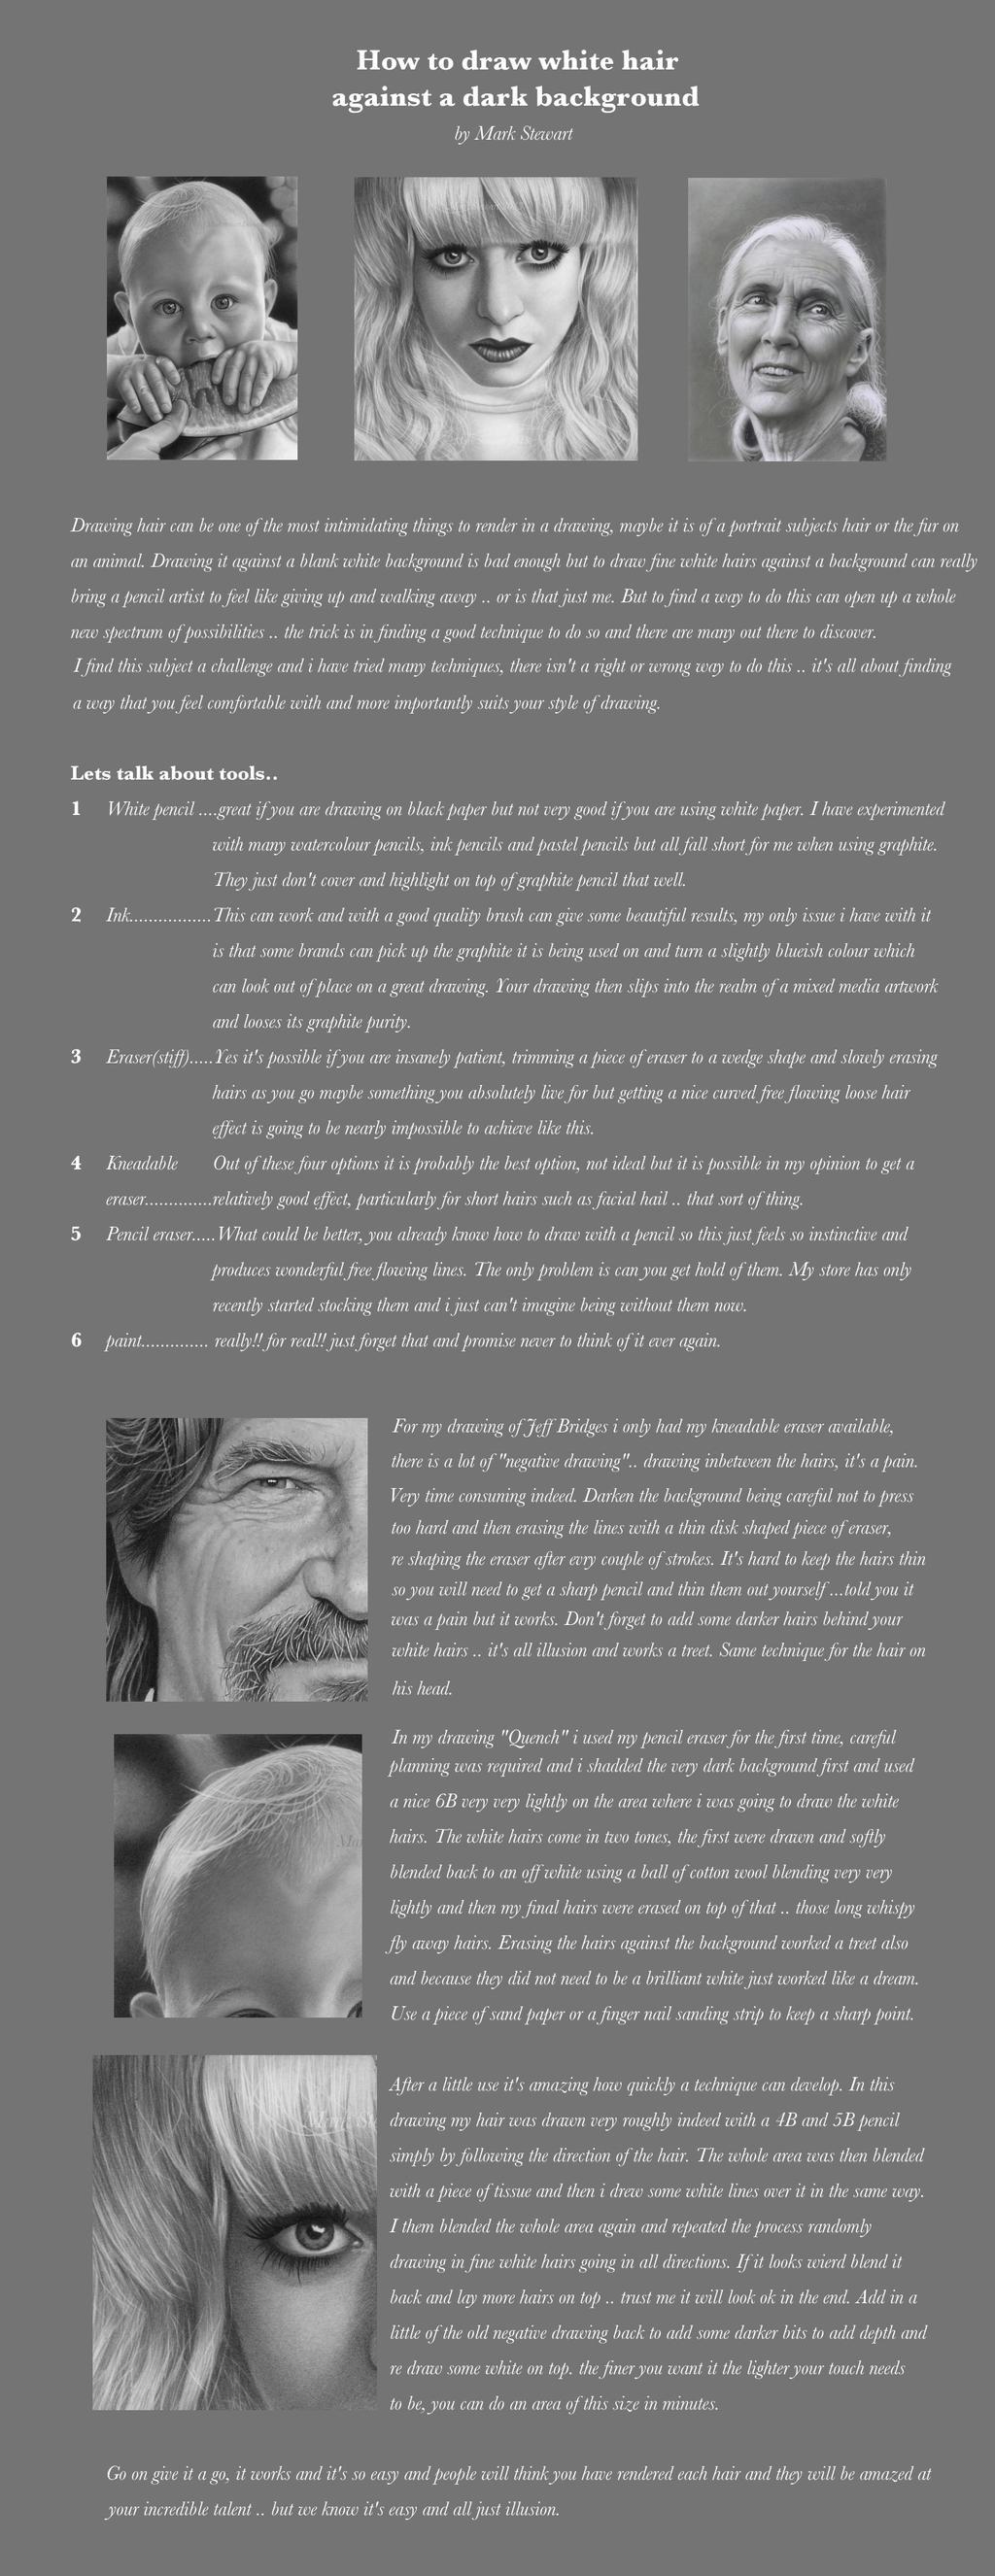 white hair tips by markstewart